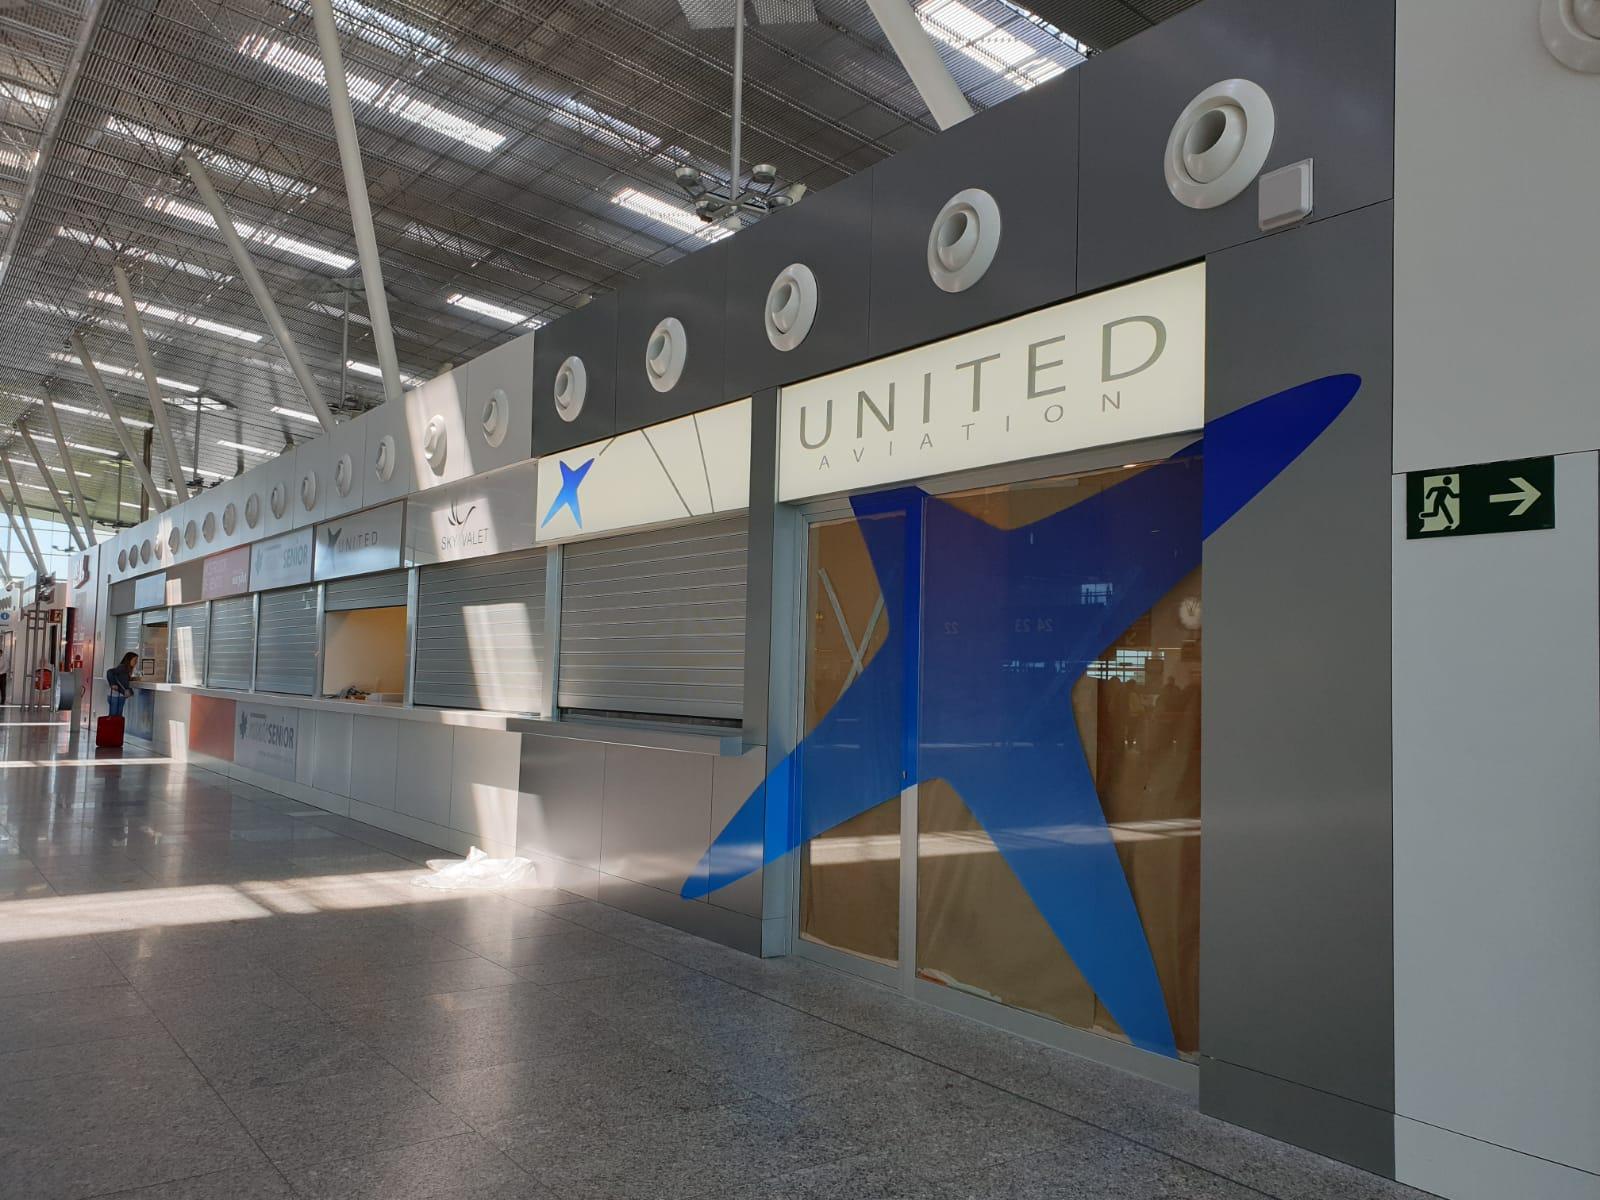 http://luzcoruna.es/wp-content/uploads/2020/03/United-6.jpg